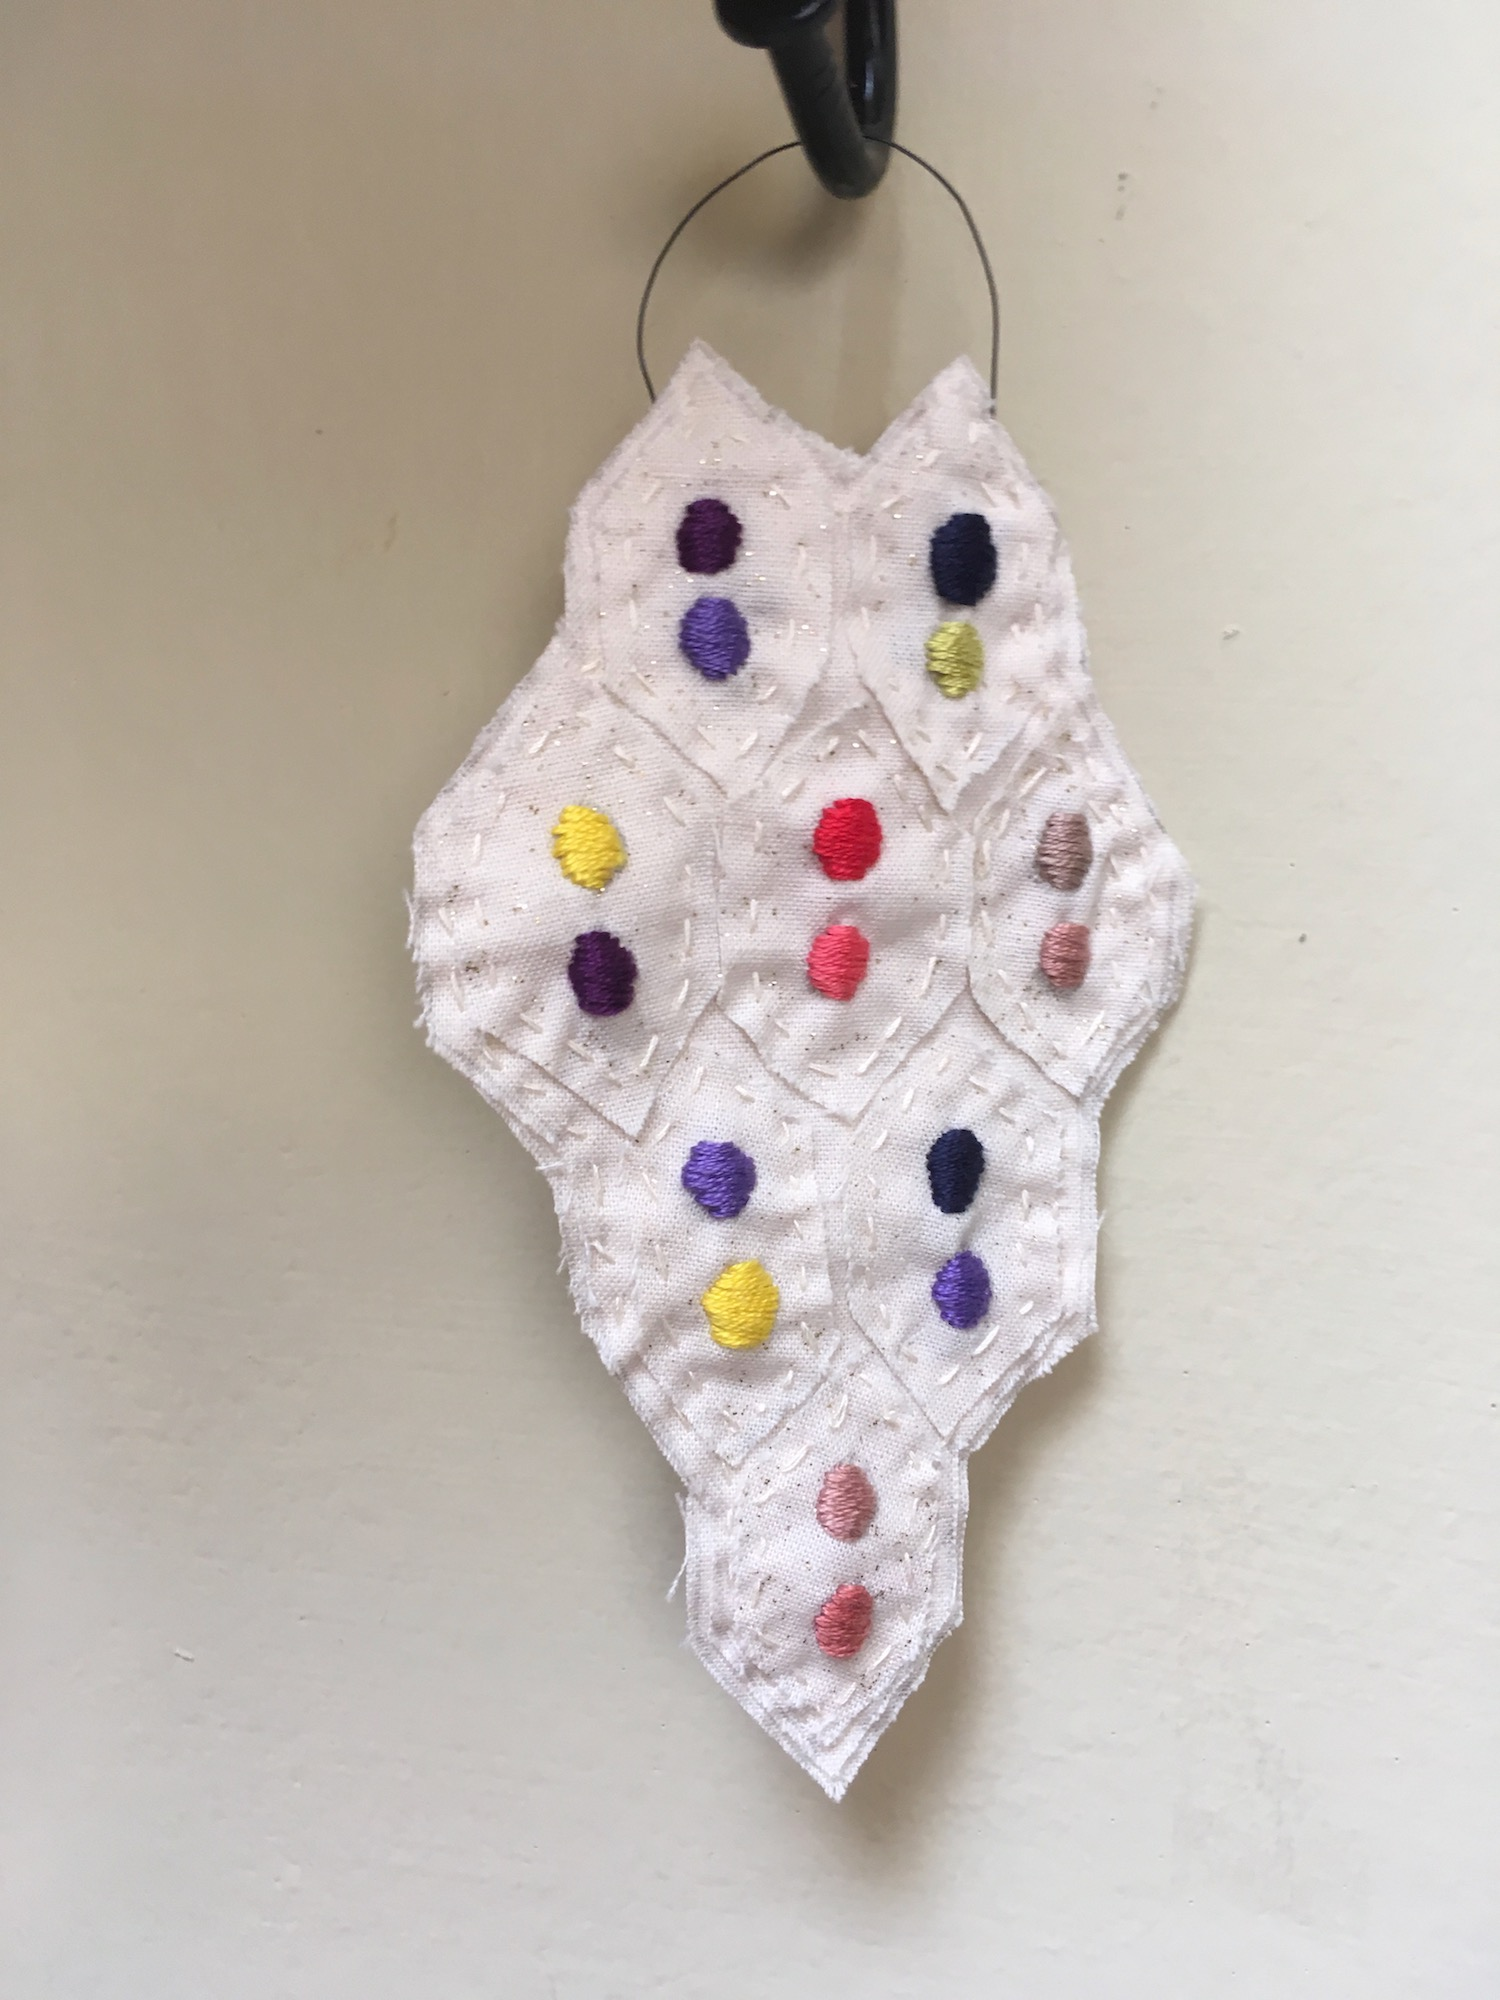 textile wall hanging no. 5 - dot by dot